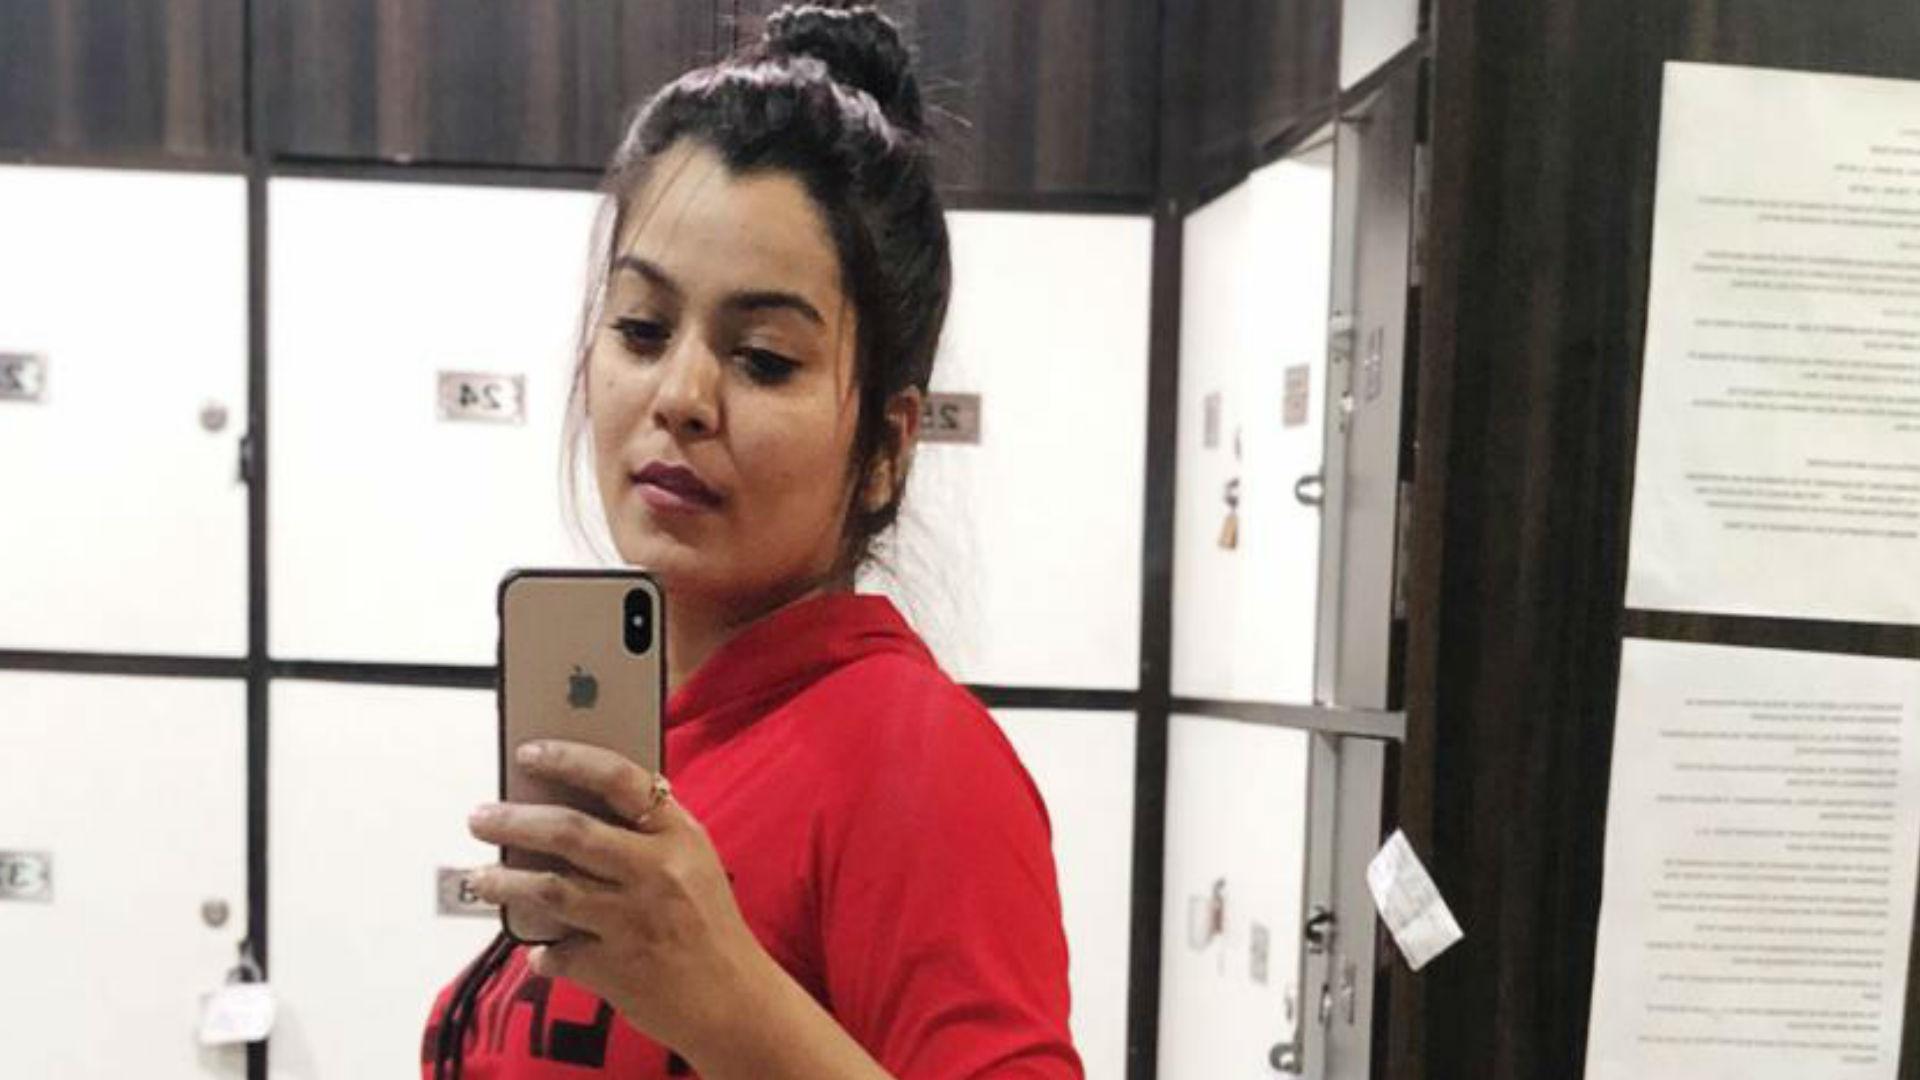 एक्सक्लूसिव: भोजपुरी एक्ट्रेस निधि झा के हाथ लगी बॉलीवुड फिल्म, कुछ यूं तैयारी में लगी लूलिया गर्ल